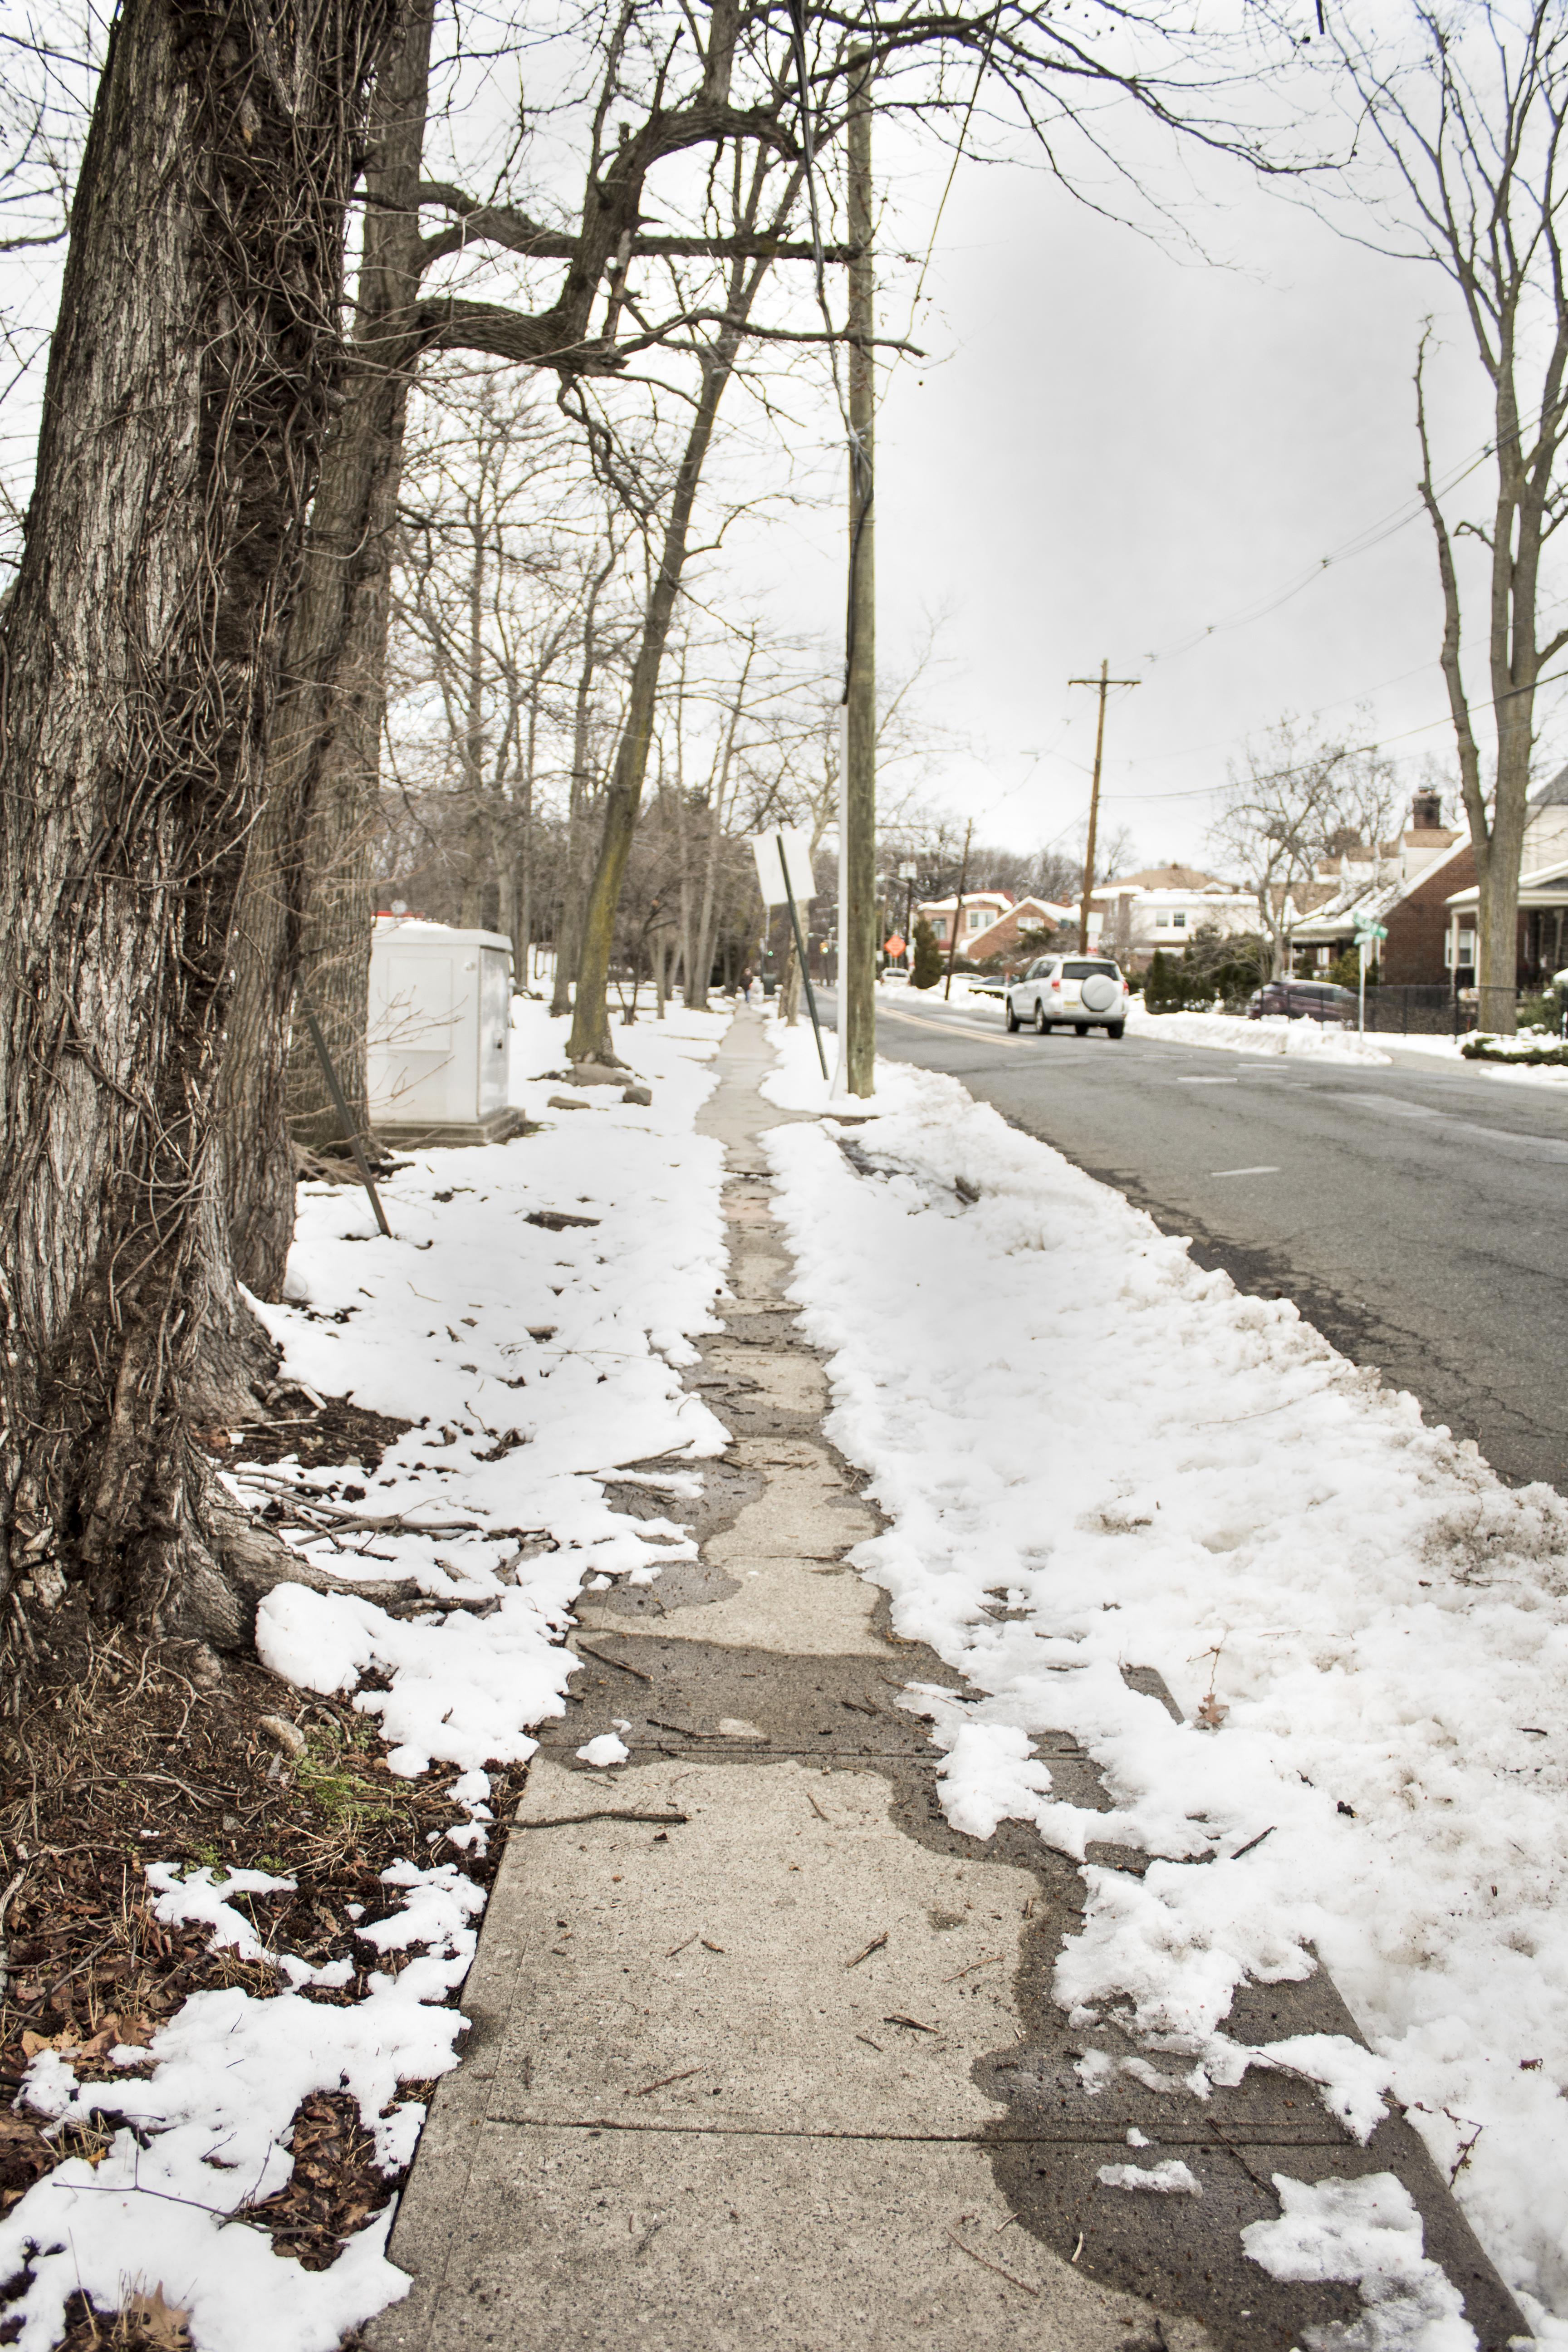 Eileen_Ko_Travel_Road_Snow_Path_Winter_Trees